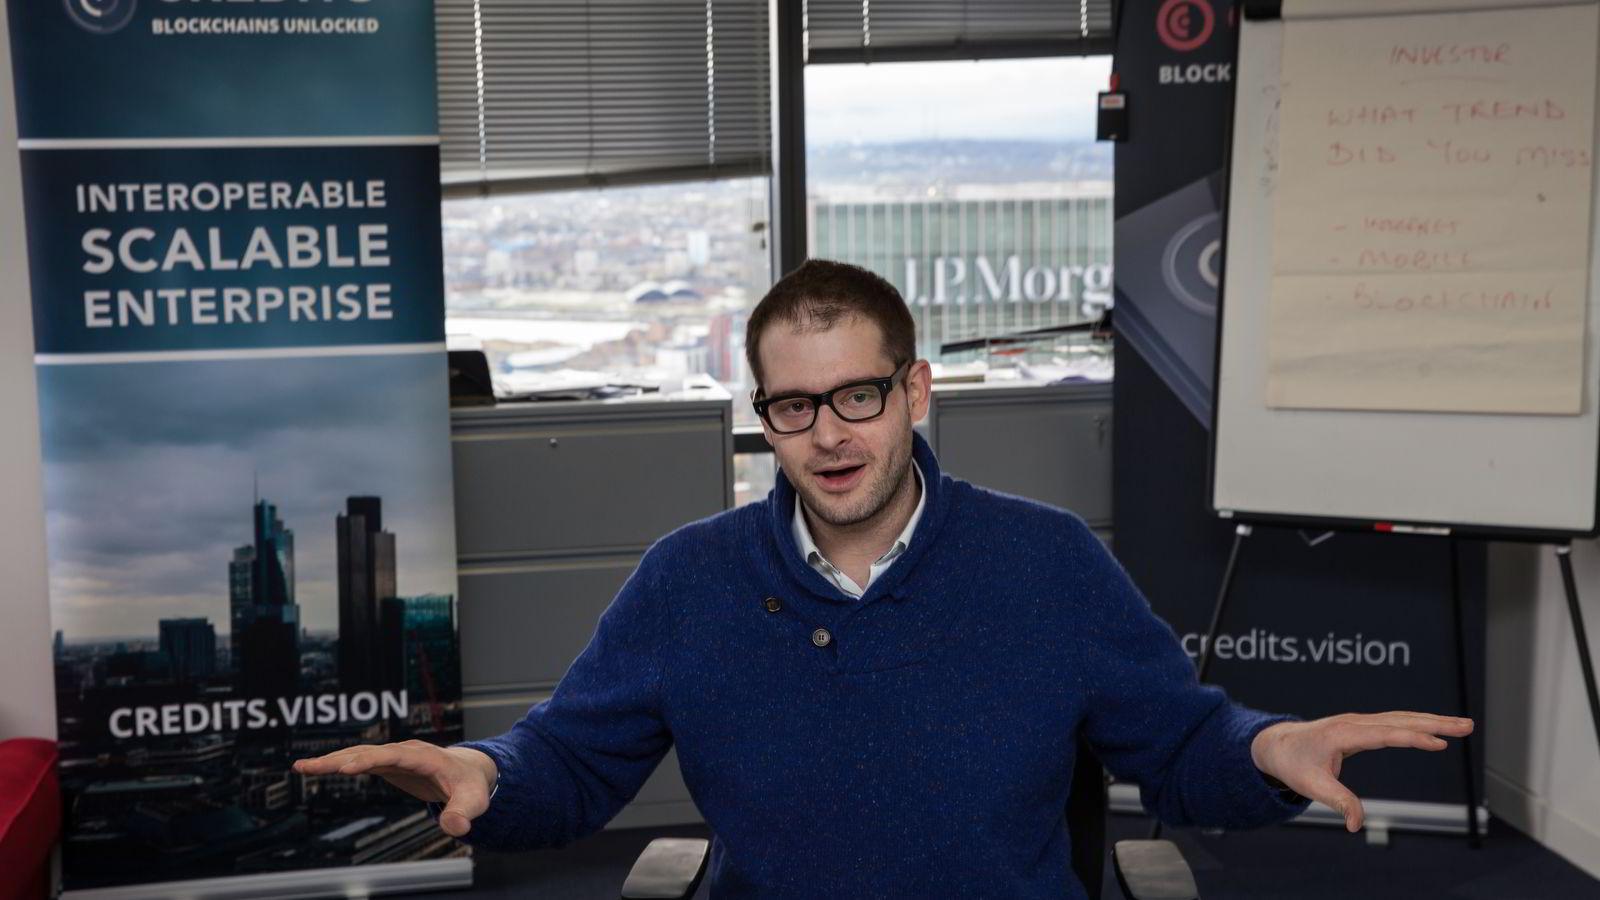 SATSER. Gründer Eric Benz vil slå seg opp på blockchain-teknologi med sitt selskap Credits i London. FOTO: Nina E. Rangøy